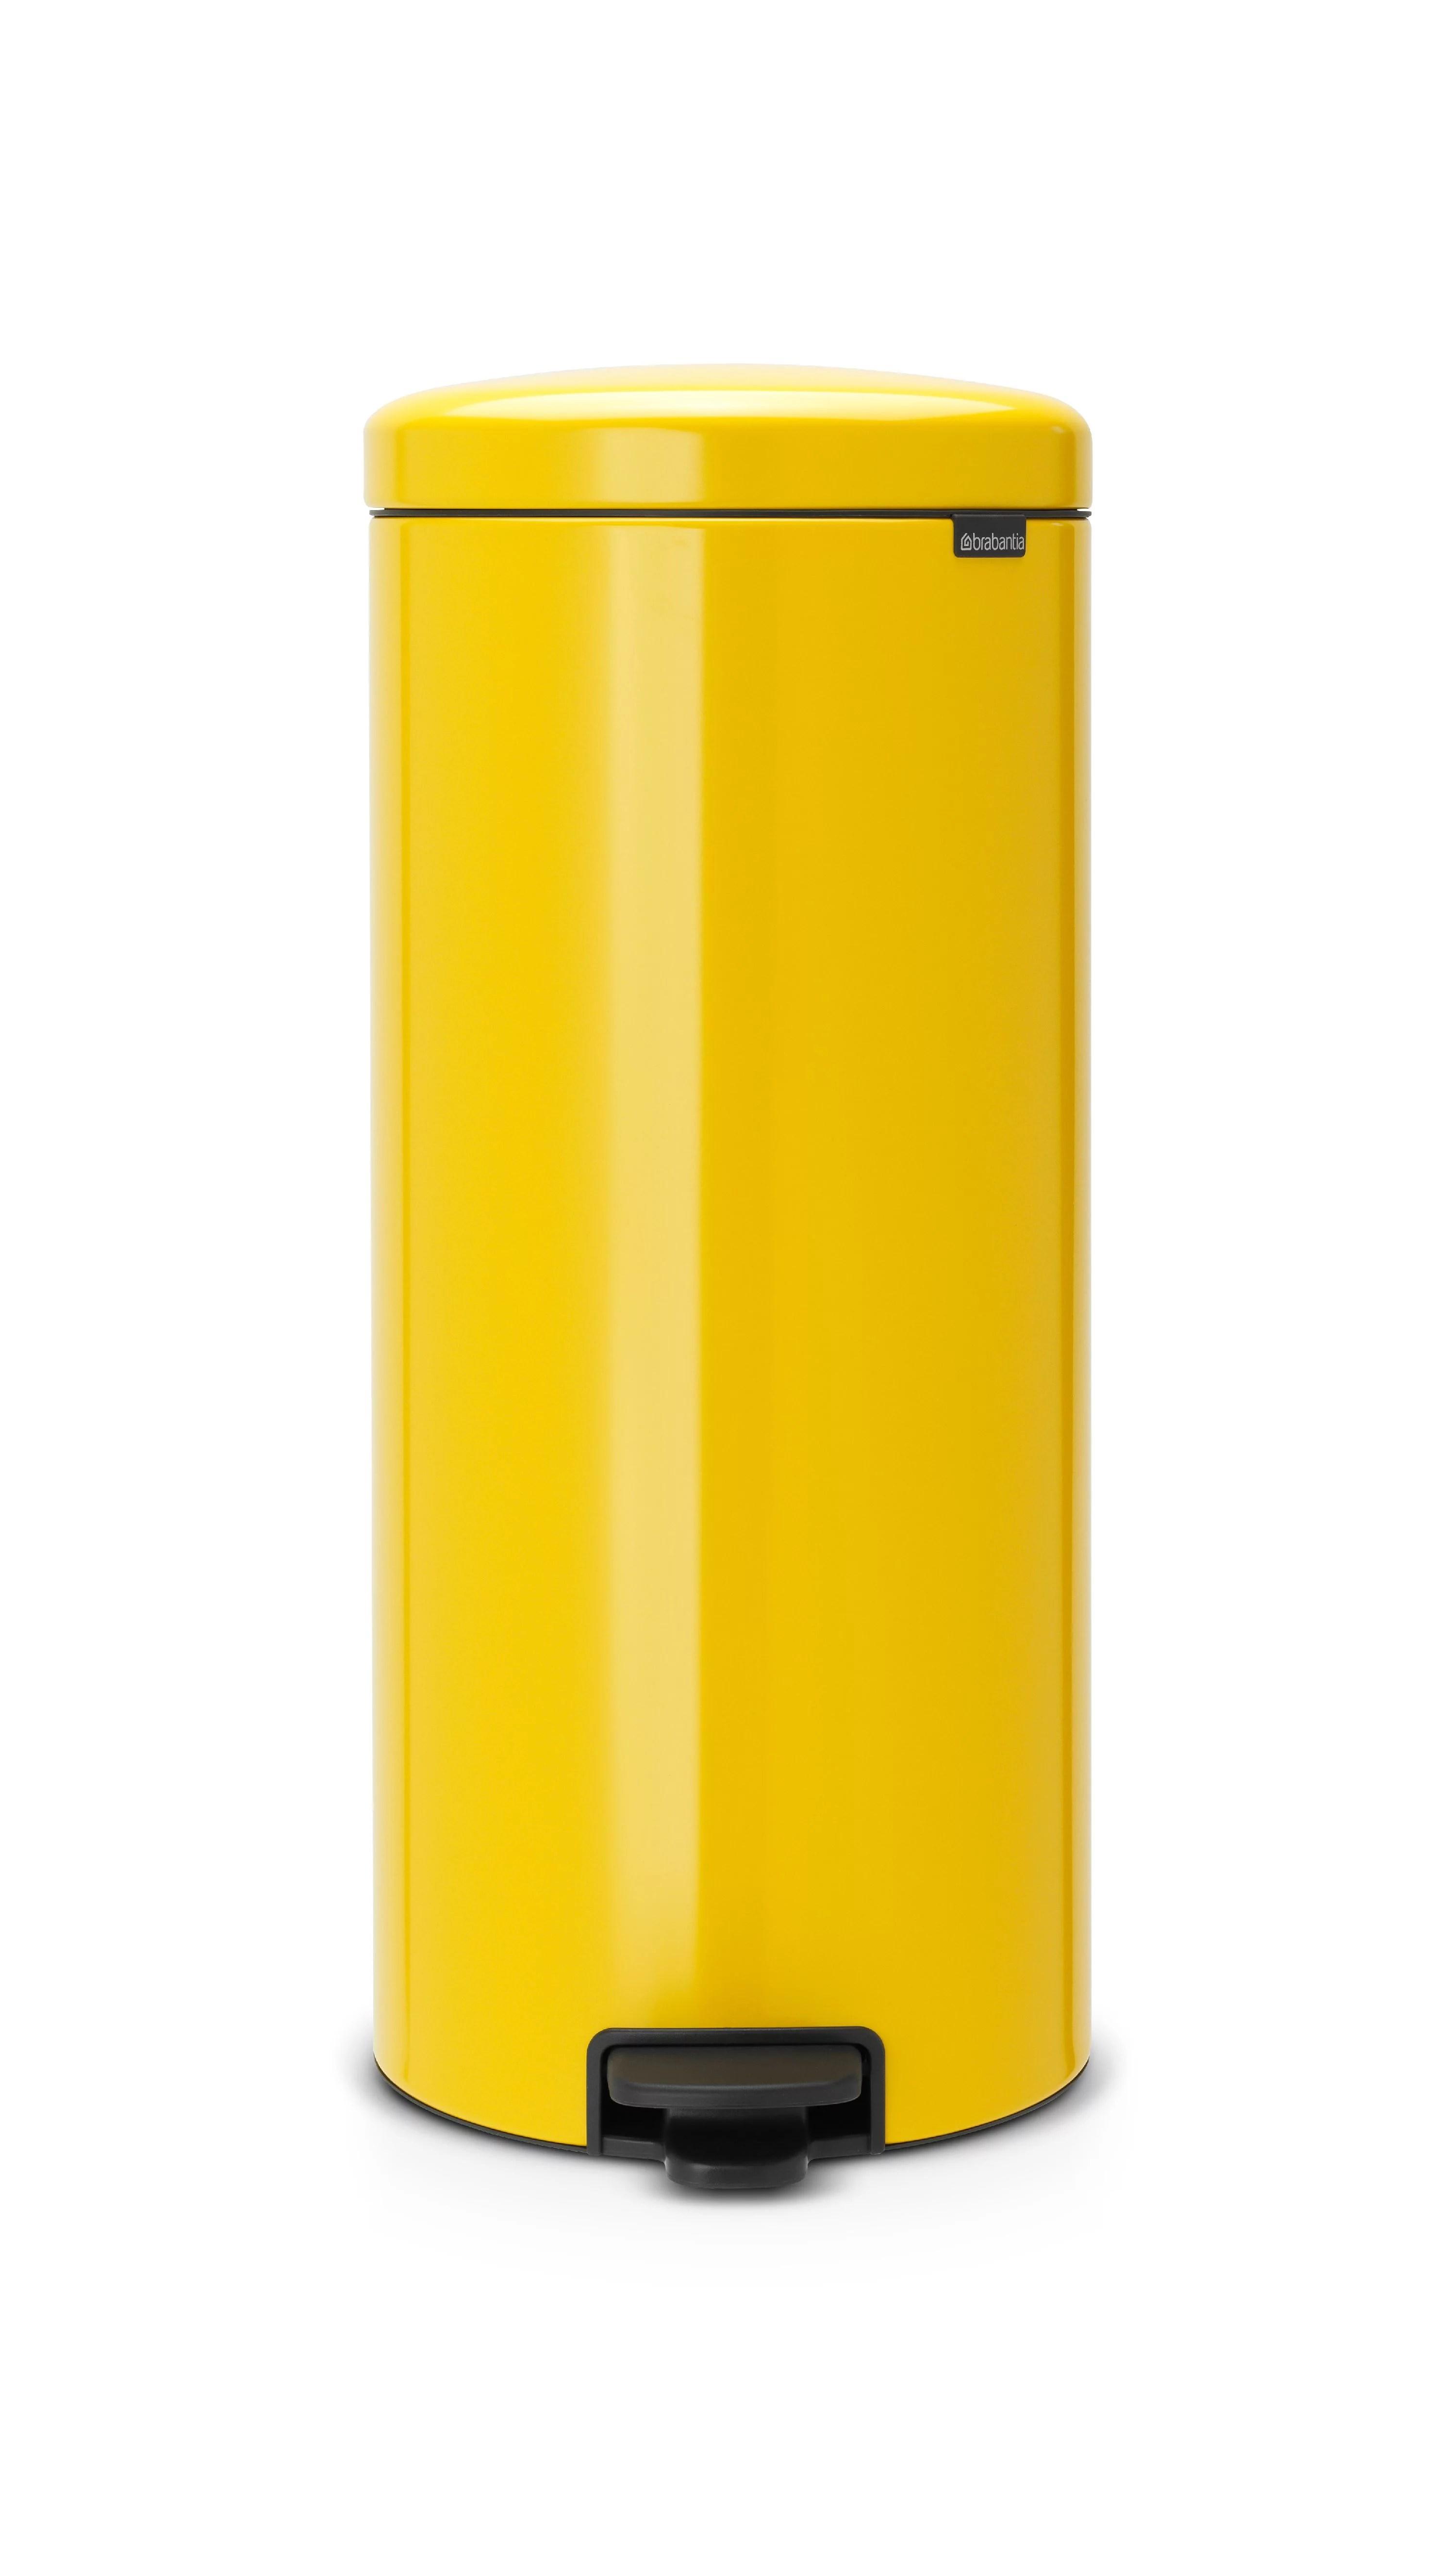 30 gallon kitchen trash can scrub brush holder brabantia newicon 8 30l daisy yellow